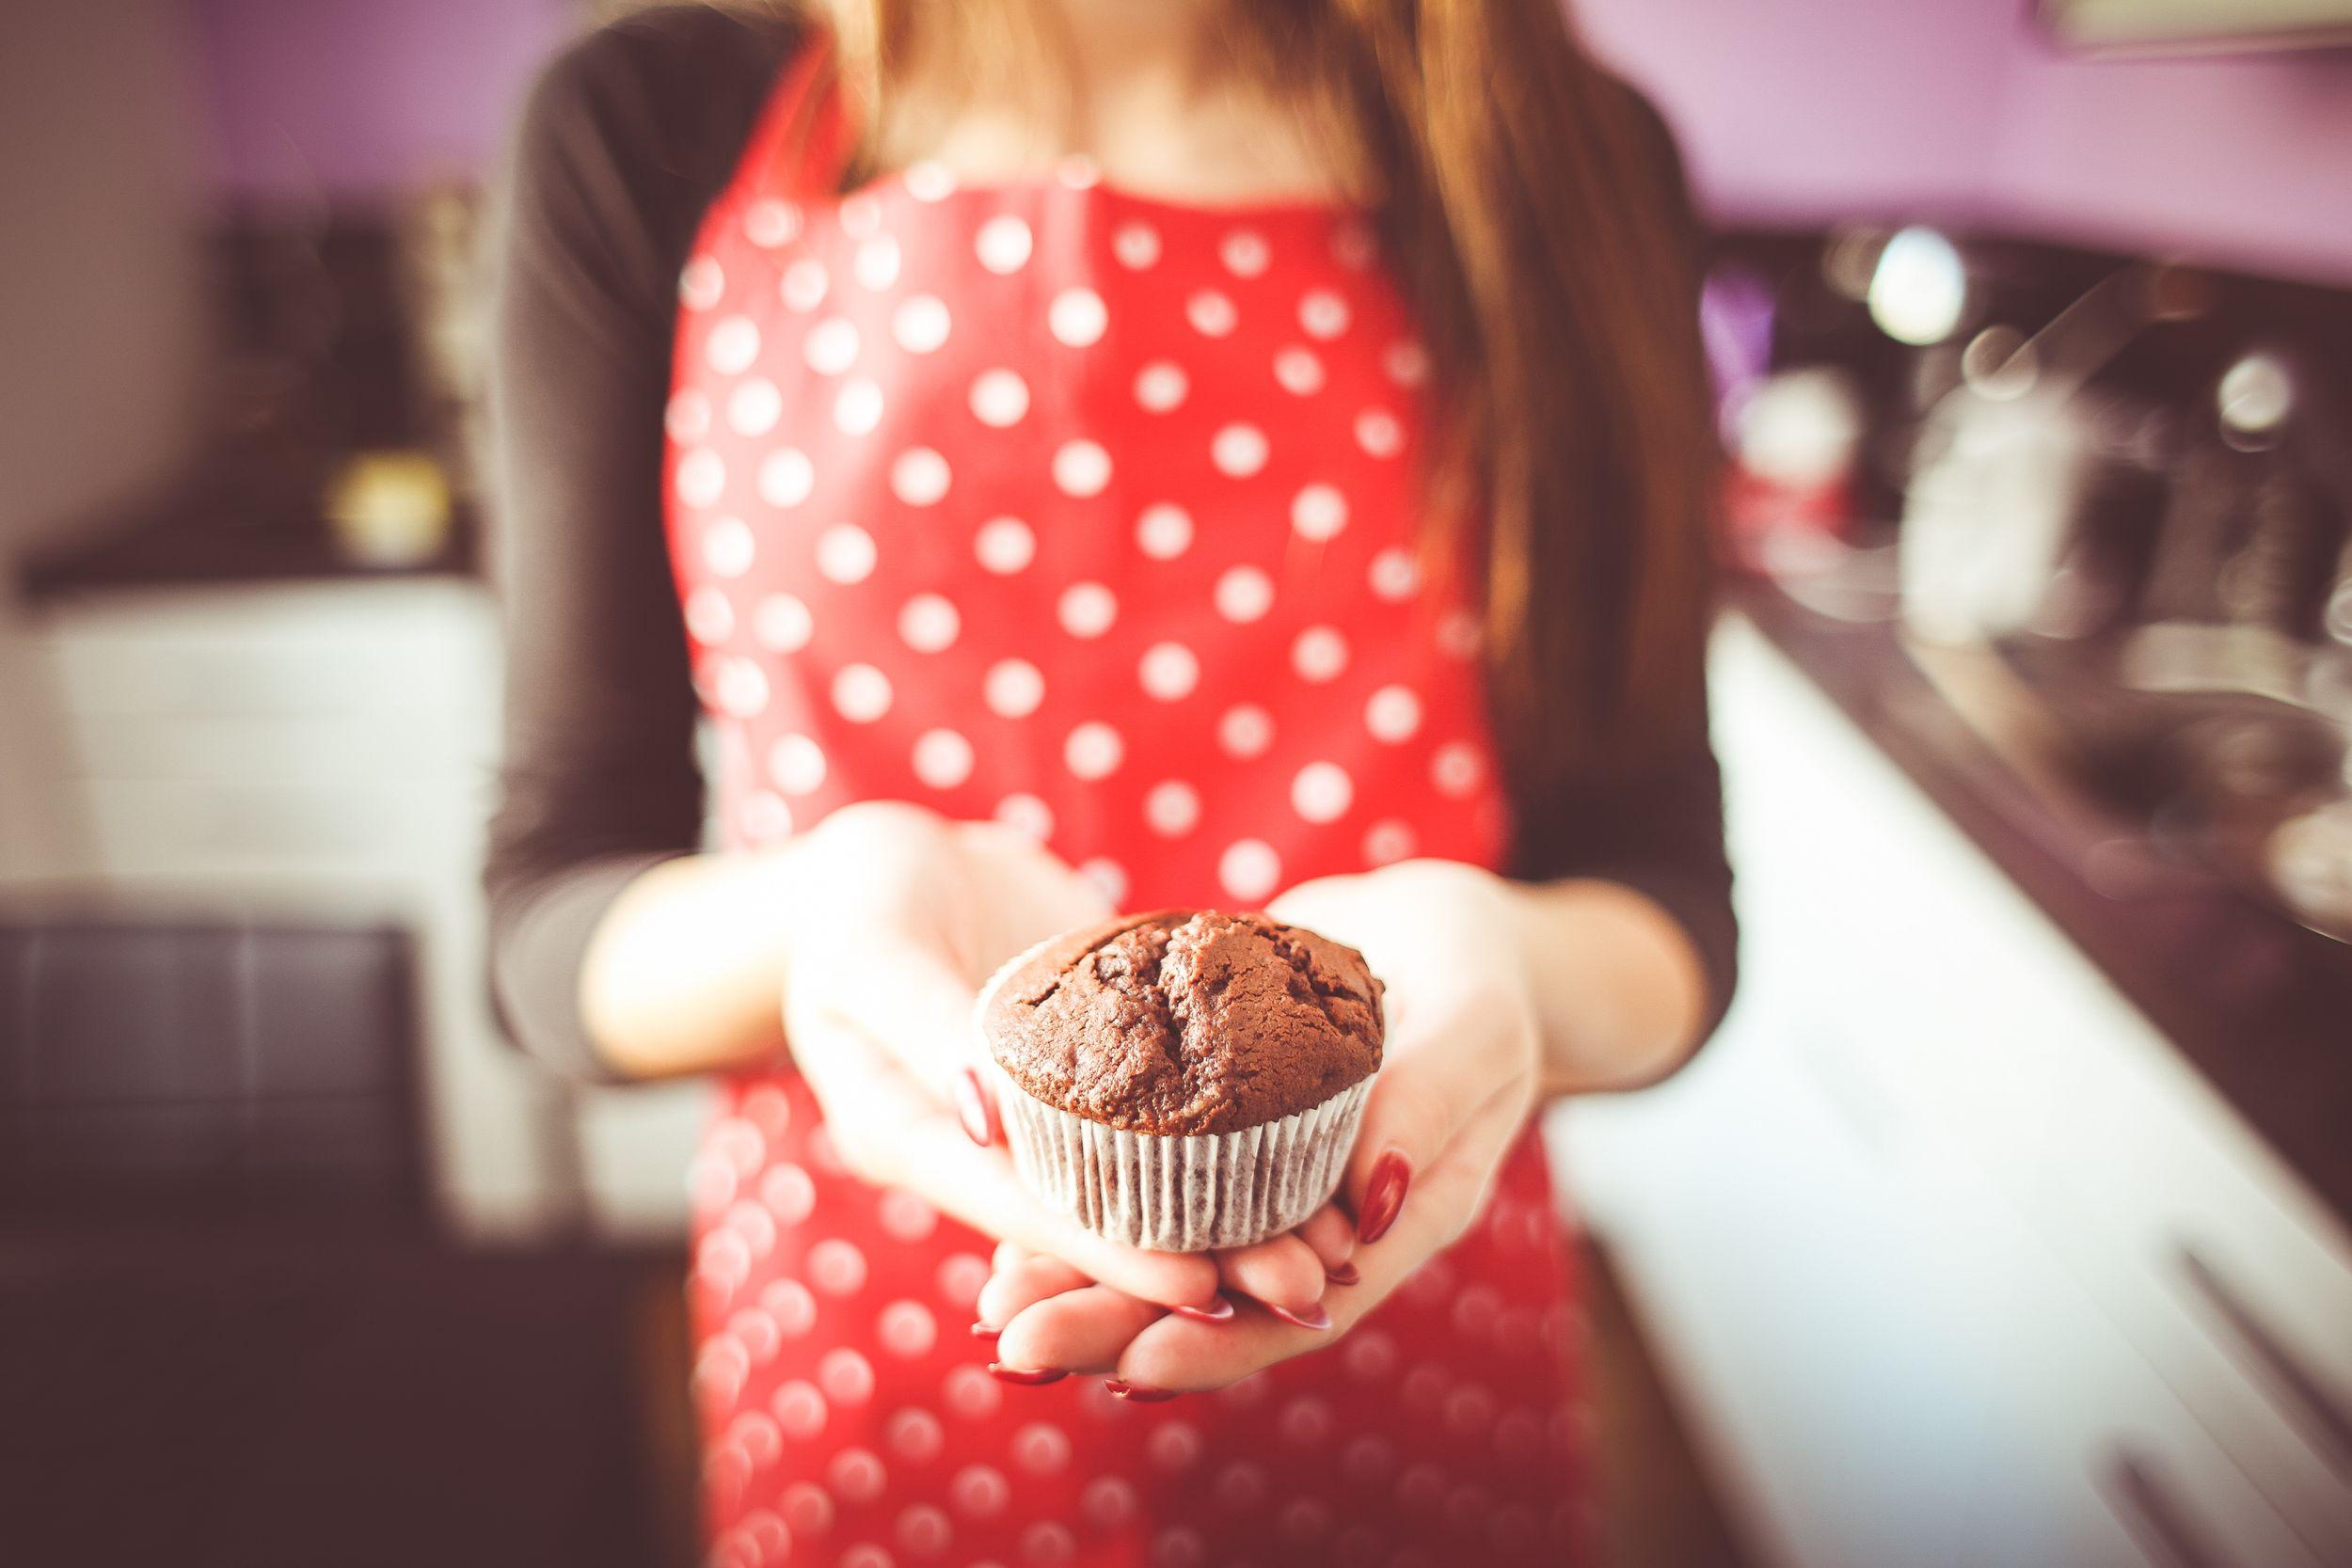 Muffinmaker Muffin Bäcker 7 Muffins Cupcakes elektrisch lila 700 W (Karton beschädigt)*12563 Bild 5